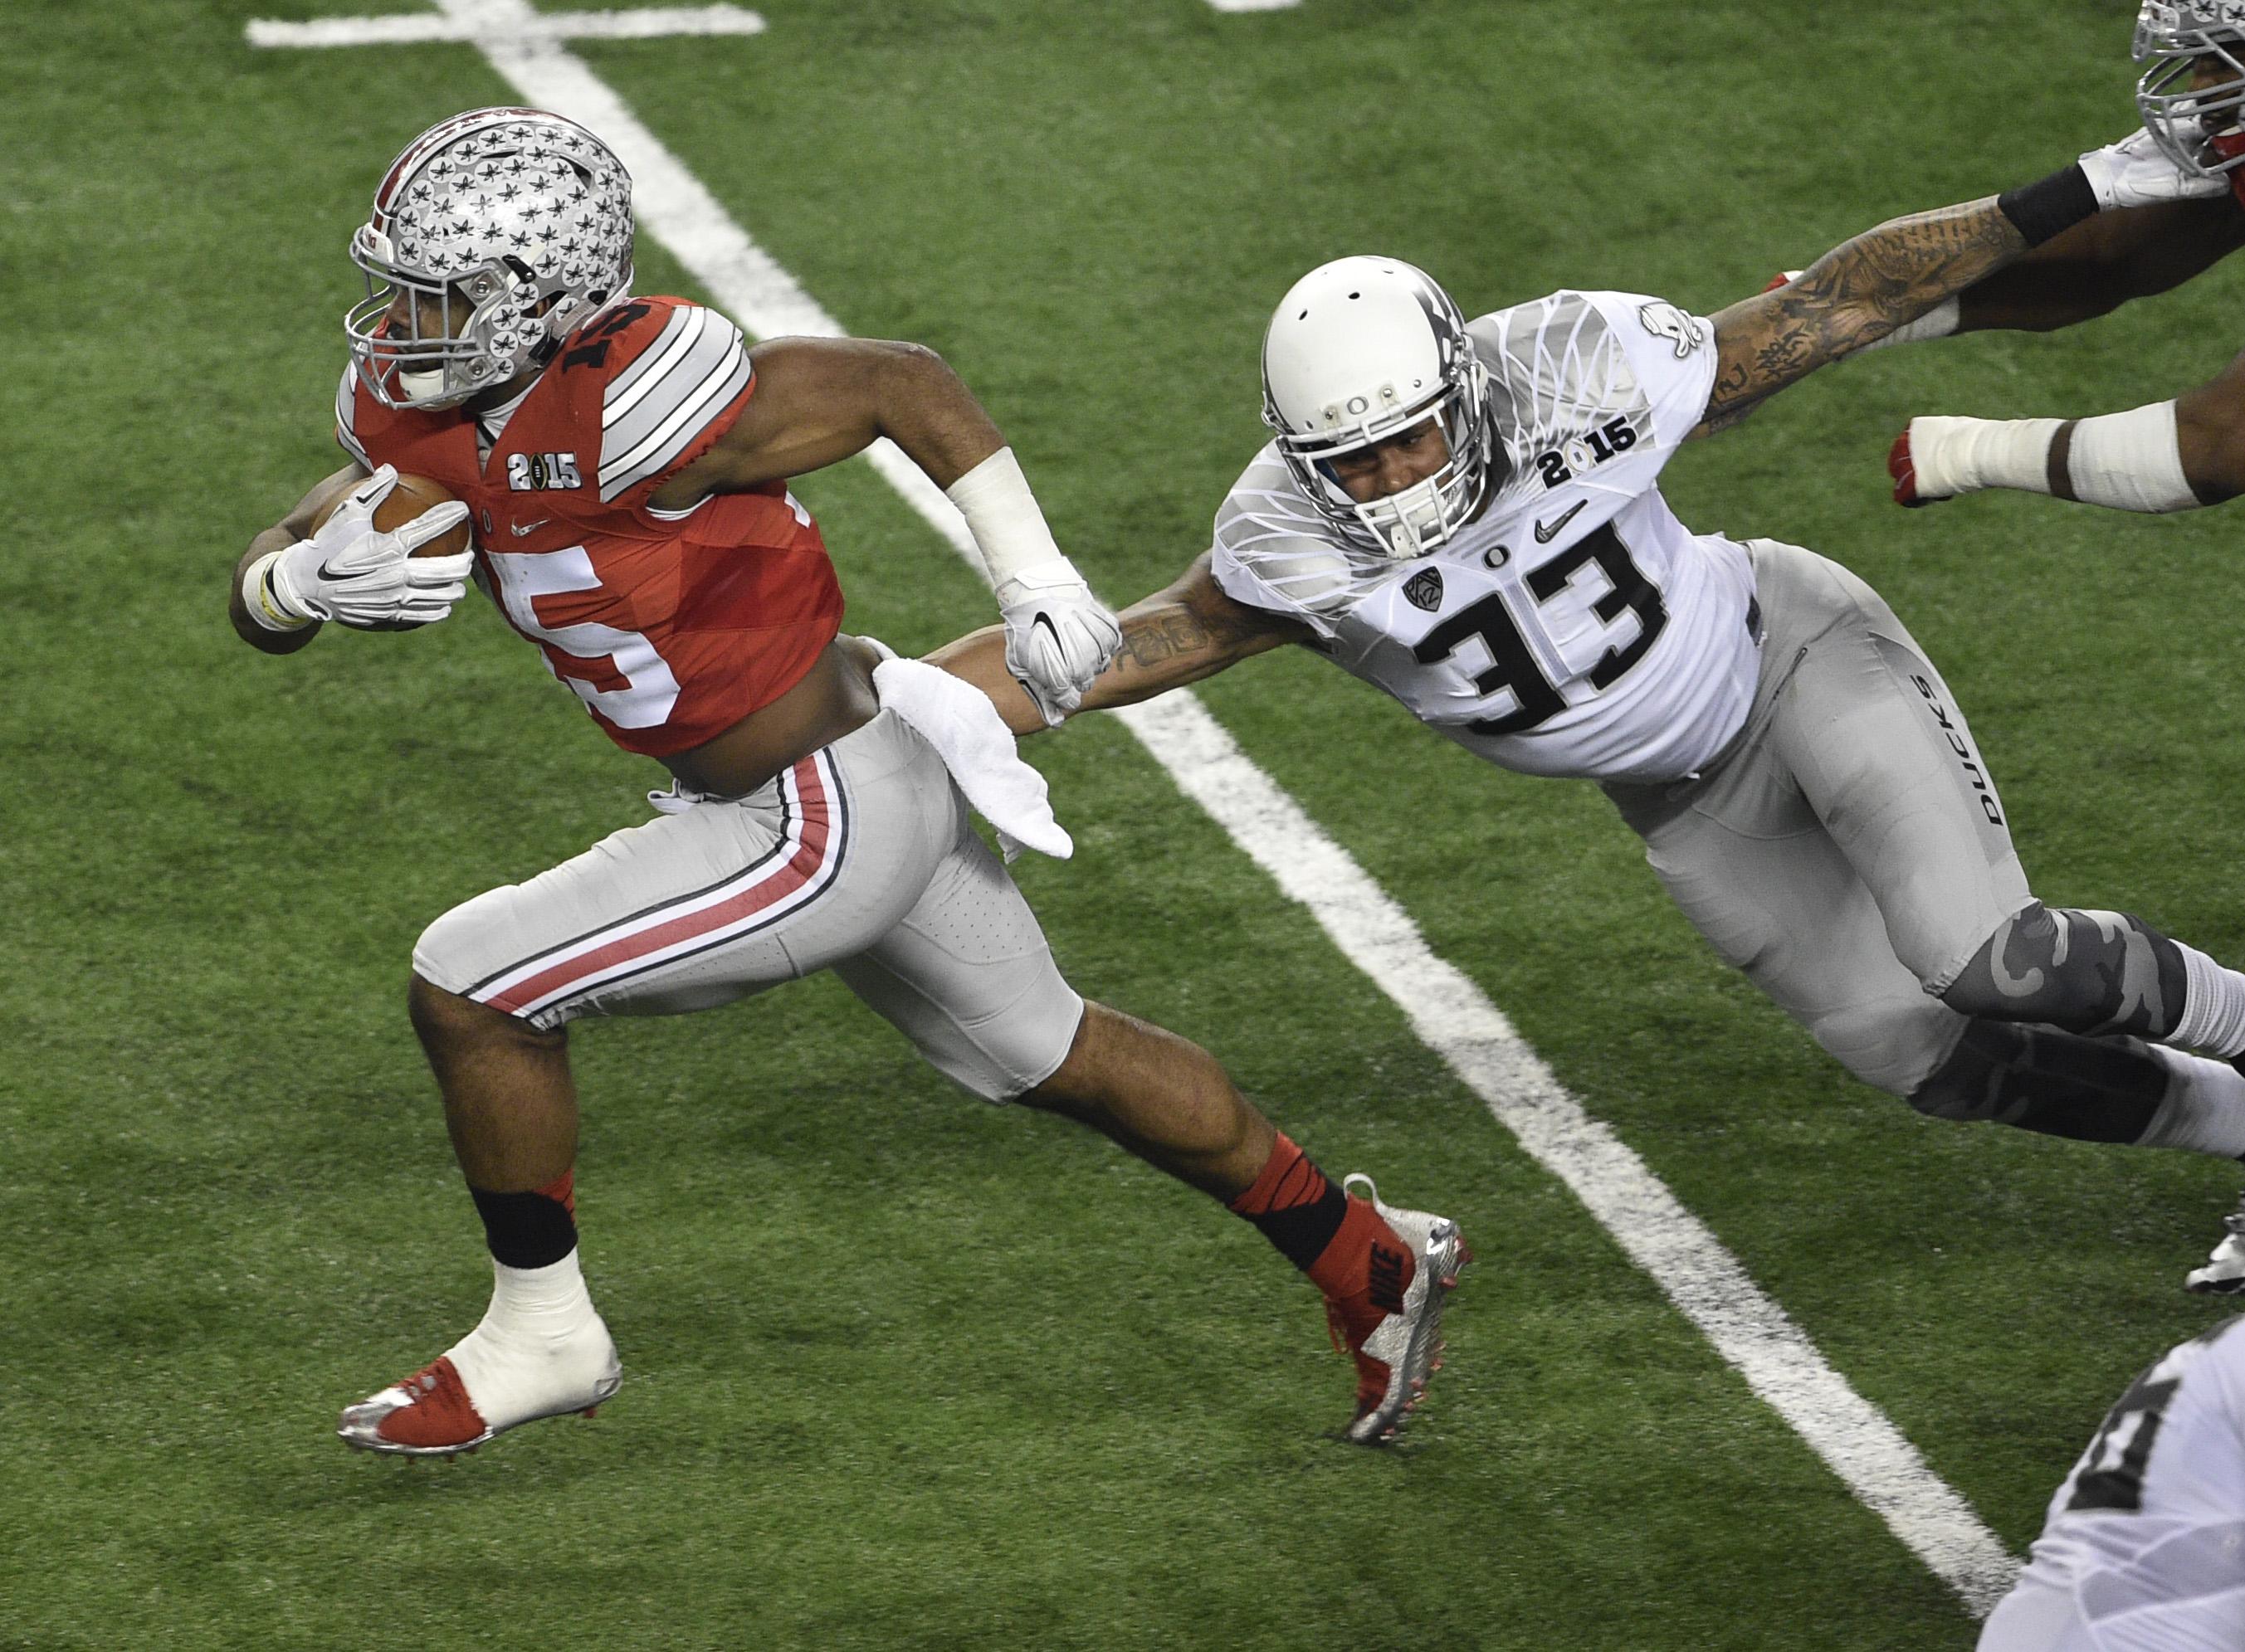 Give Zeke the ball!